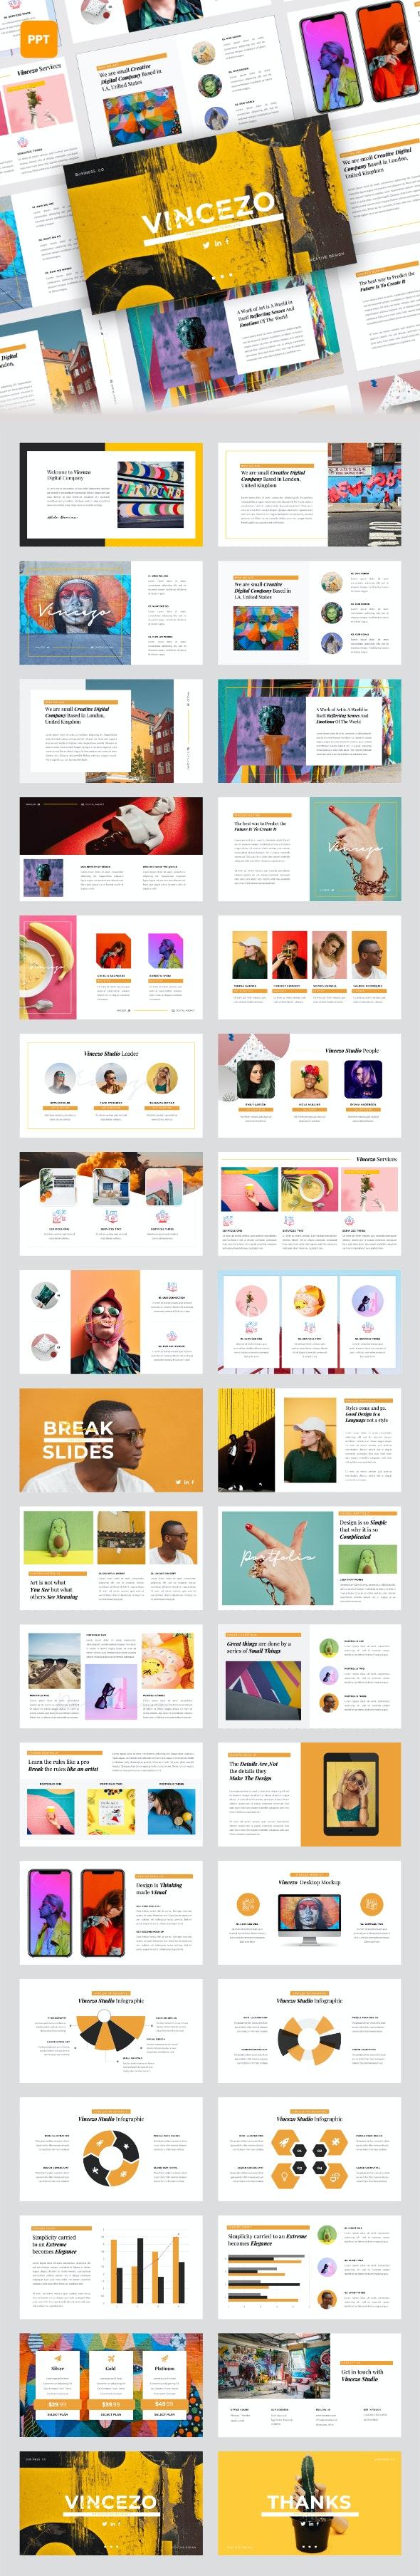 Vincazo - Creative Business PowerPoint Presentation Template - Creative PowerPoint Templates